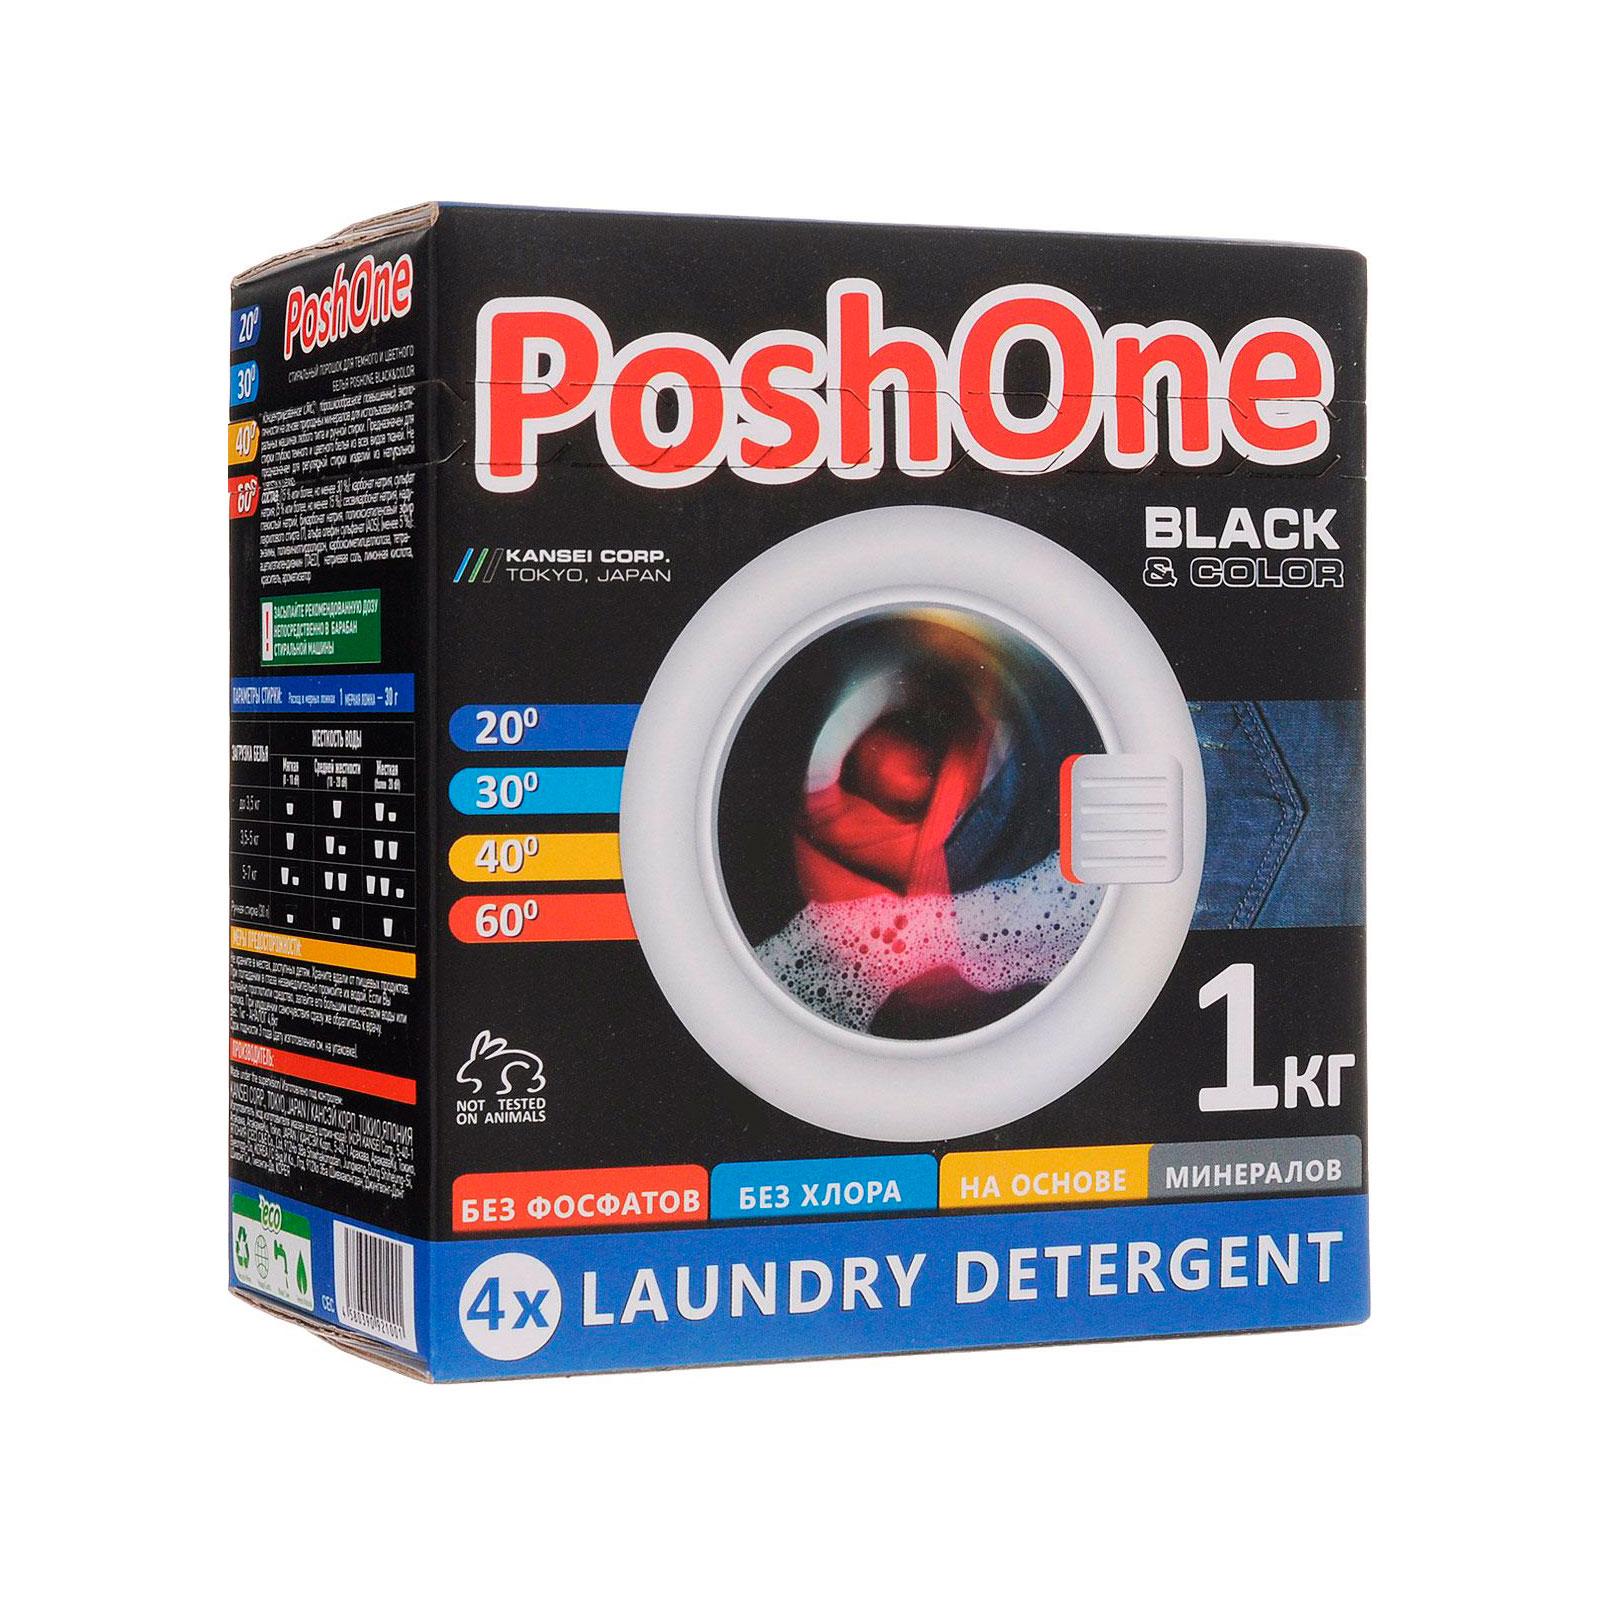 ���������� ������� Posh one BLACK 1 ��